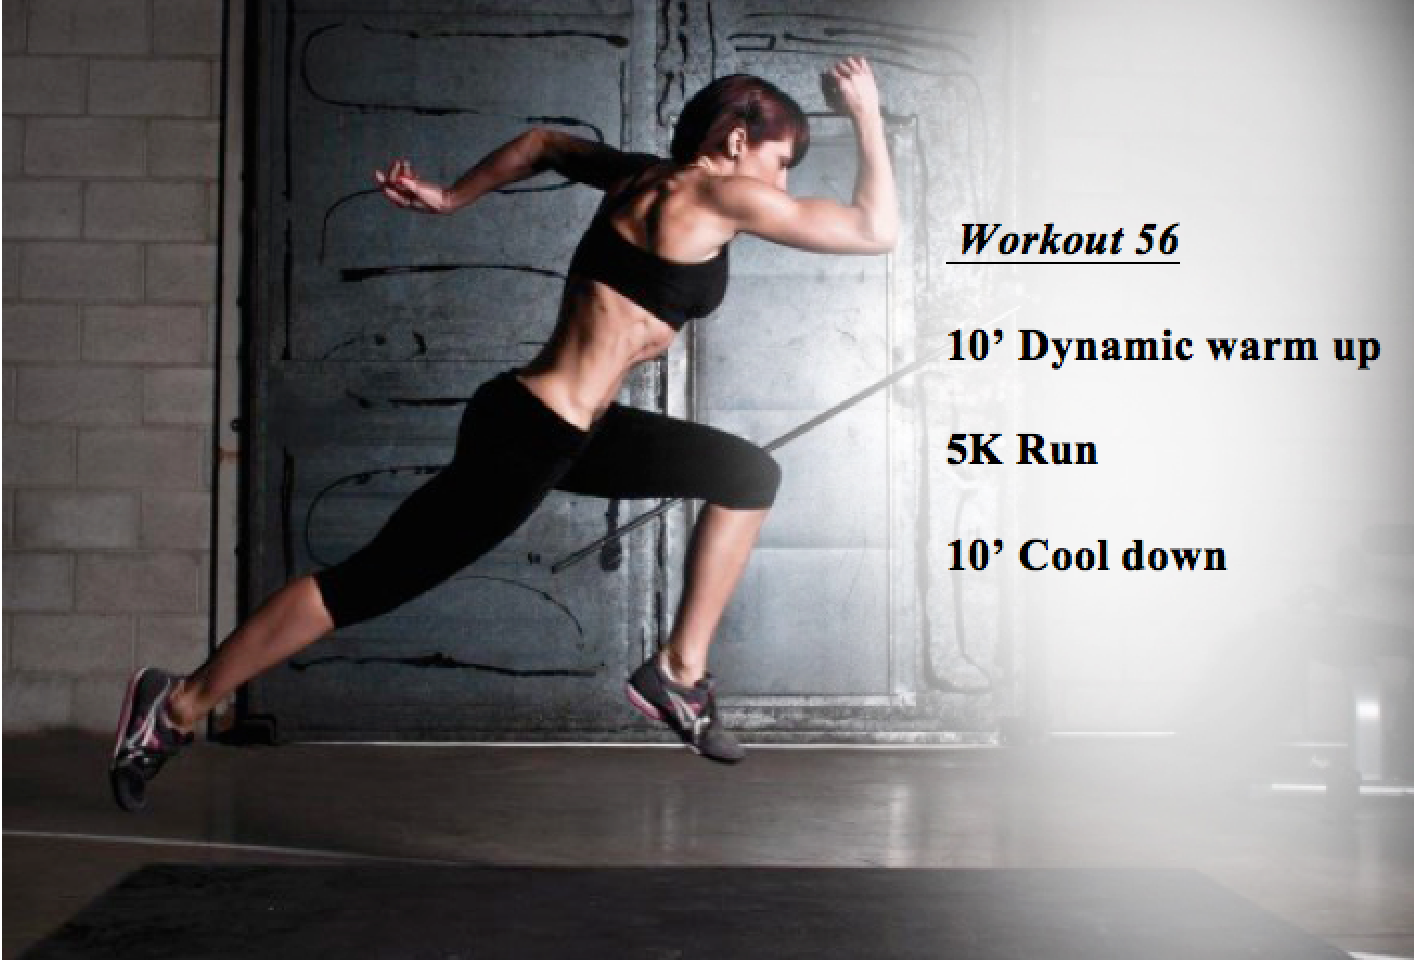 workout 56